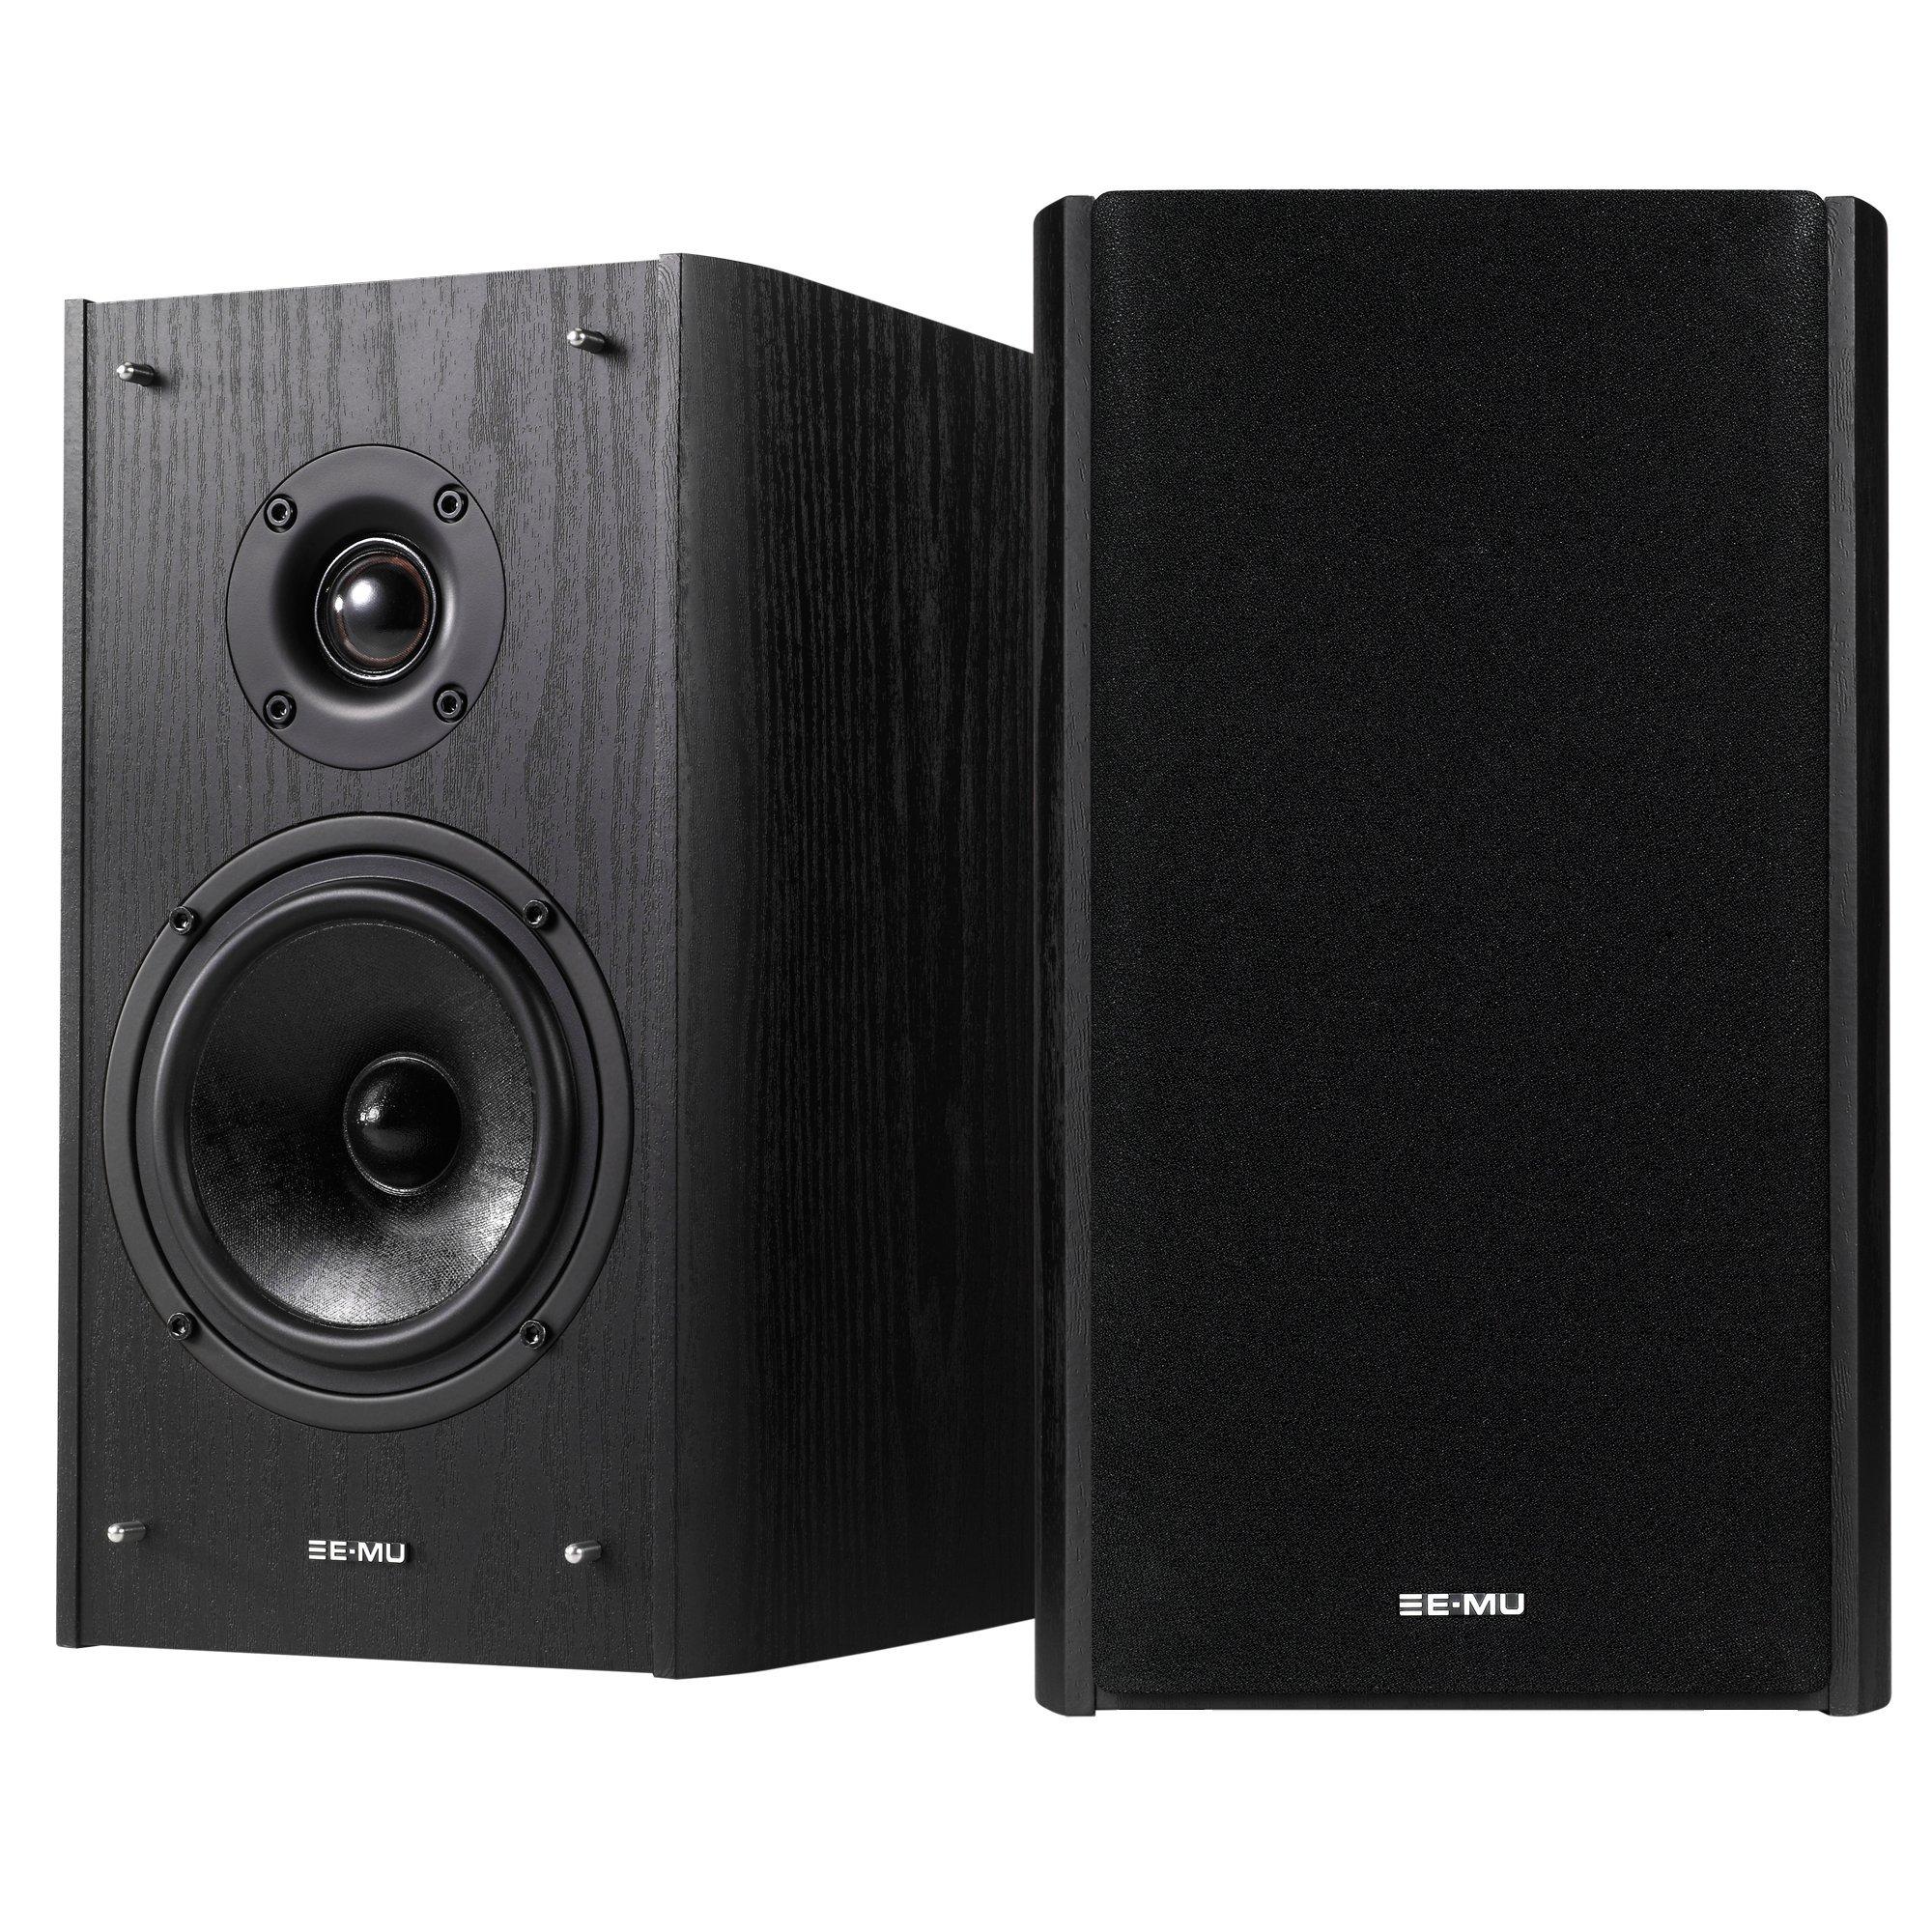 E-MU XM7 Passive Bookshelf Speakers, Black Wood Grain